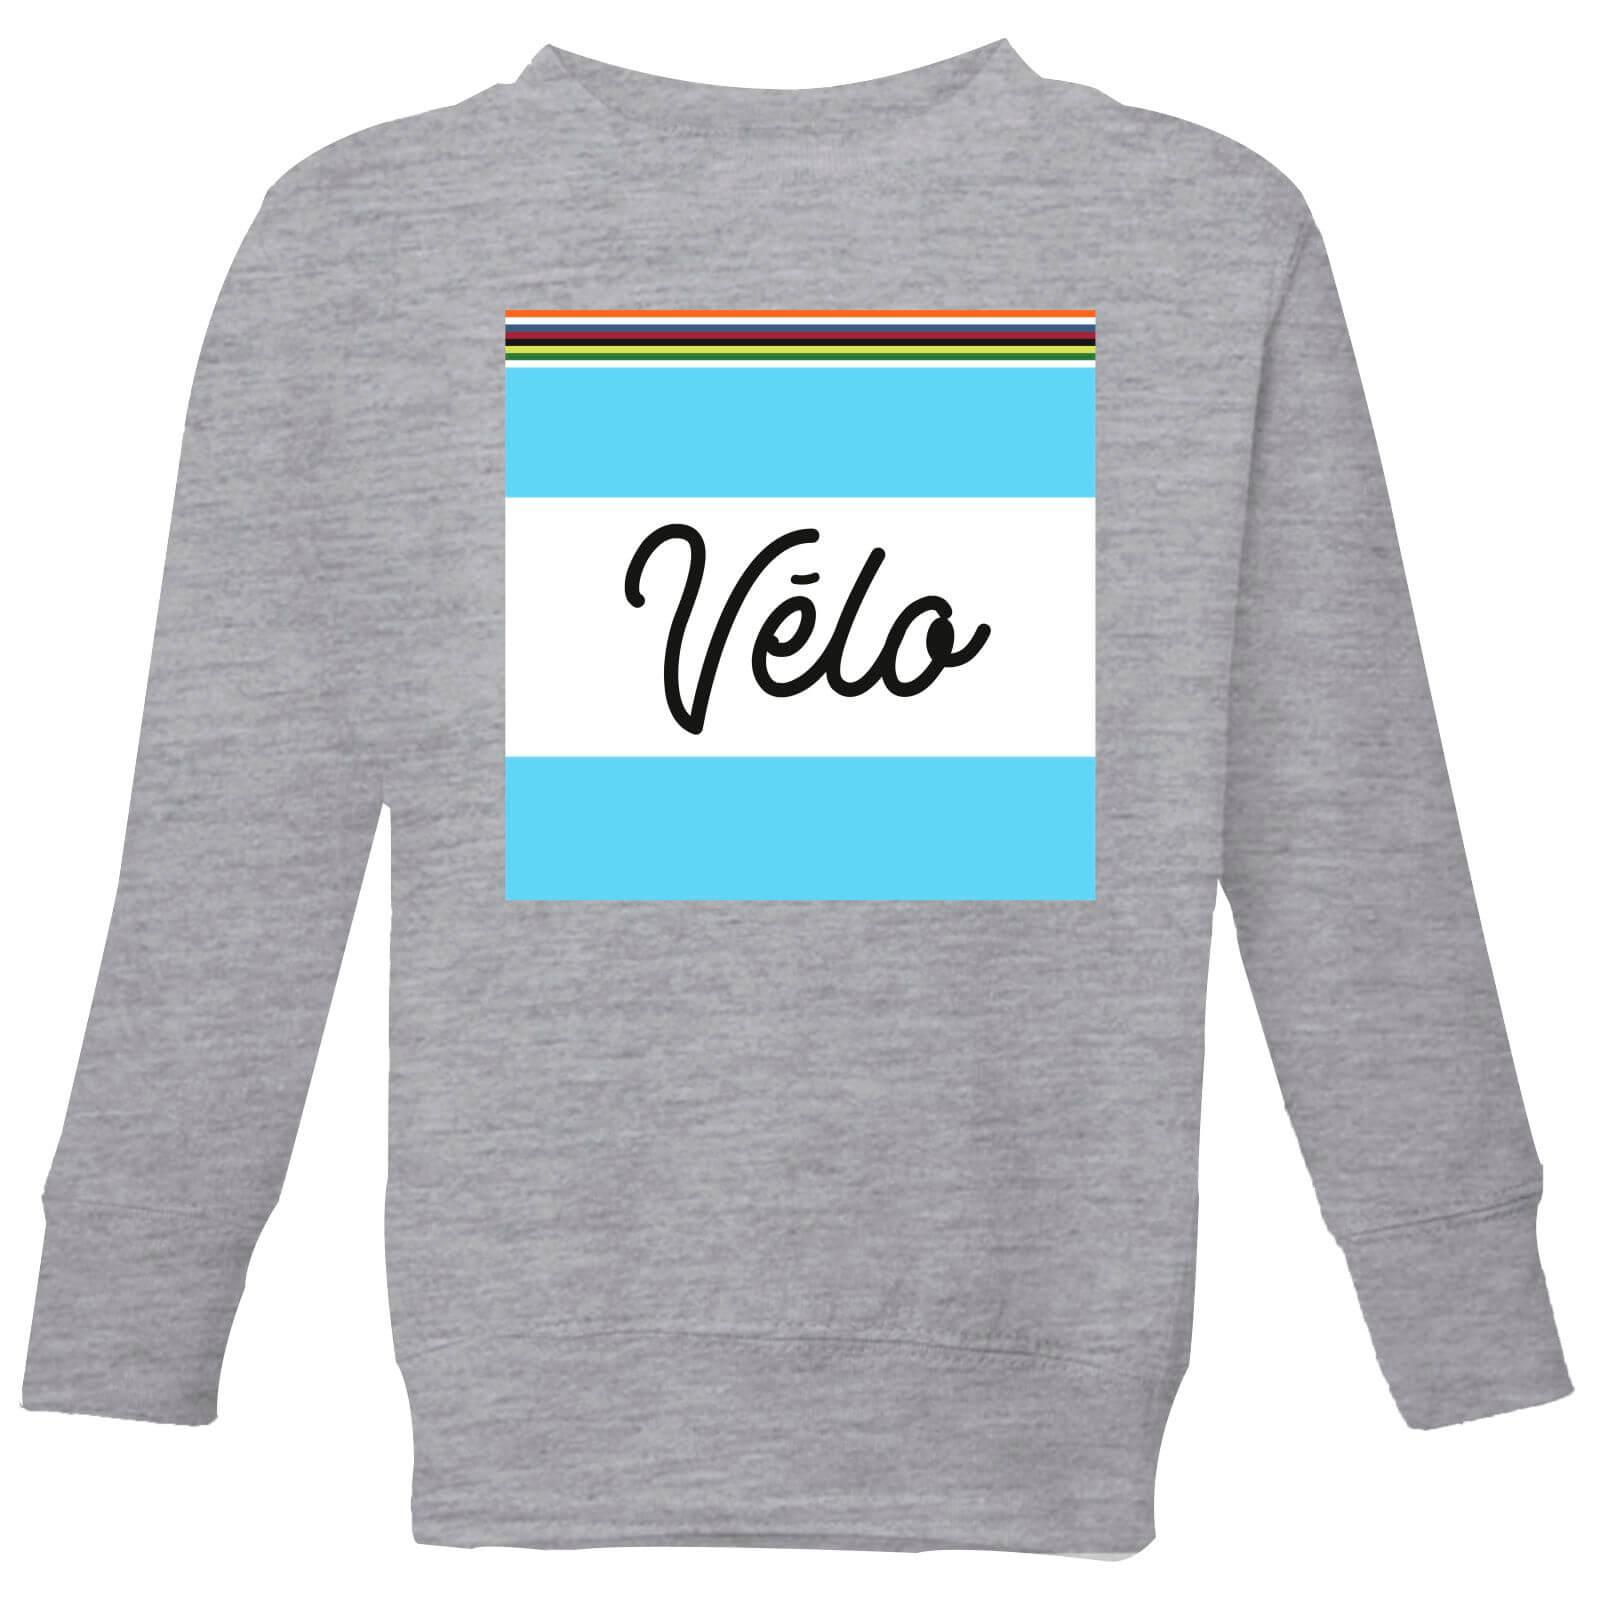 Summit Finish Velo Kids Sweatshirt - Grey - 3-4 Jahre - Grau